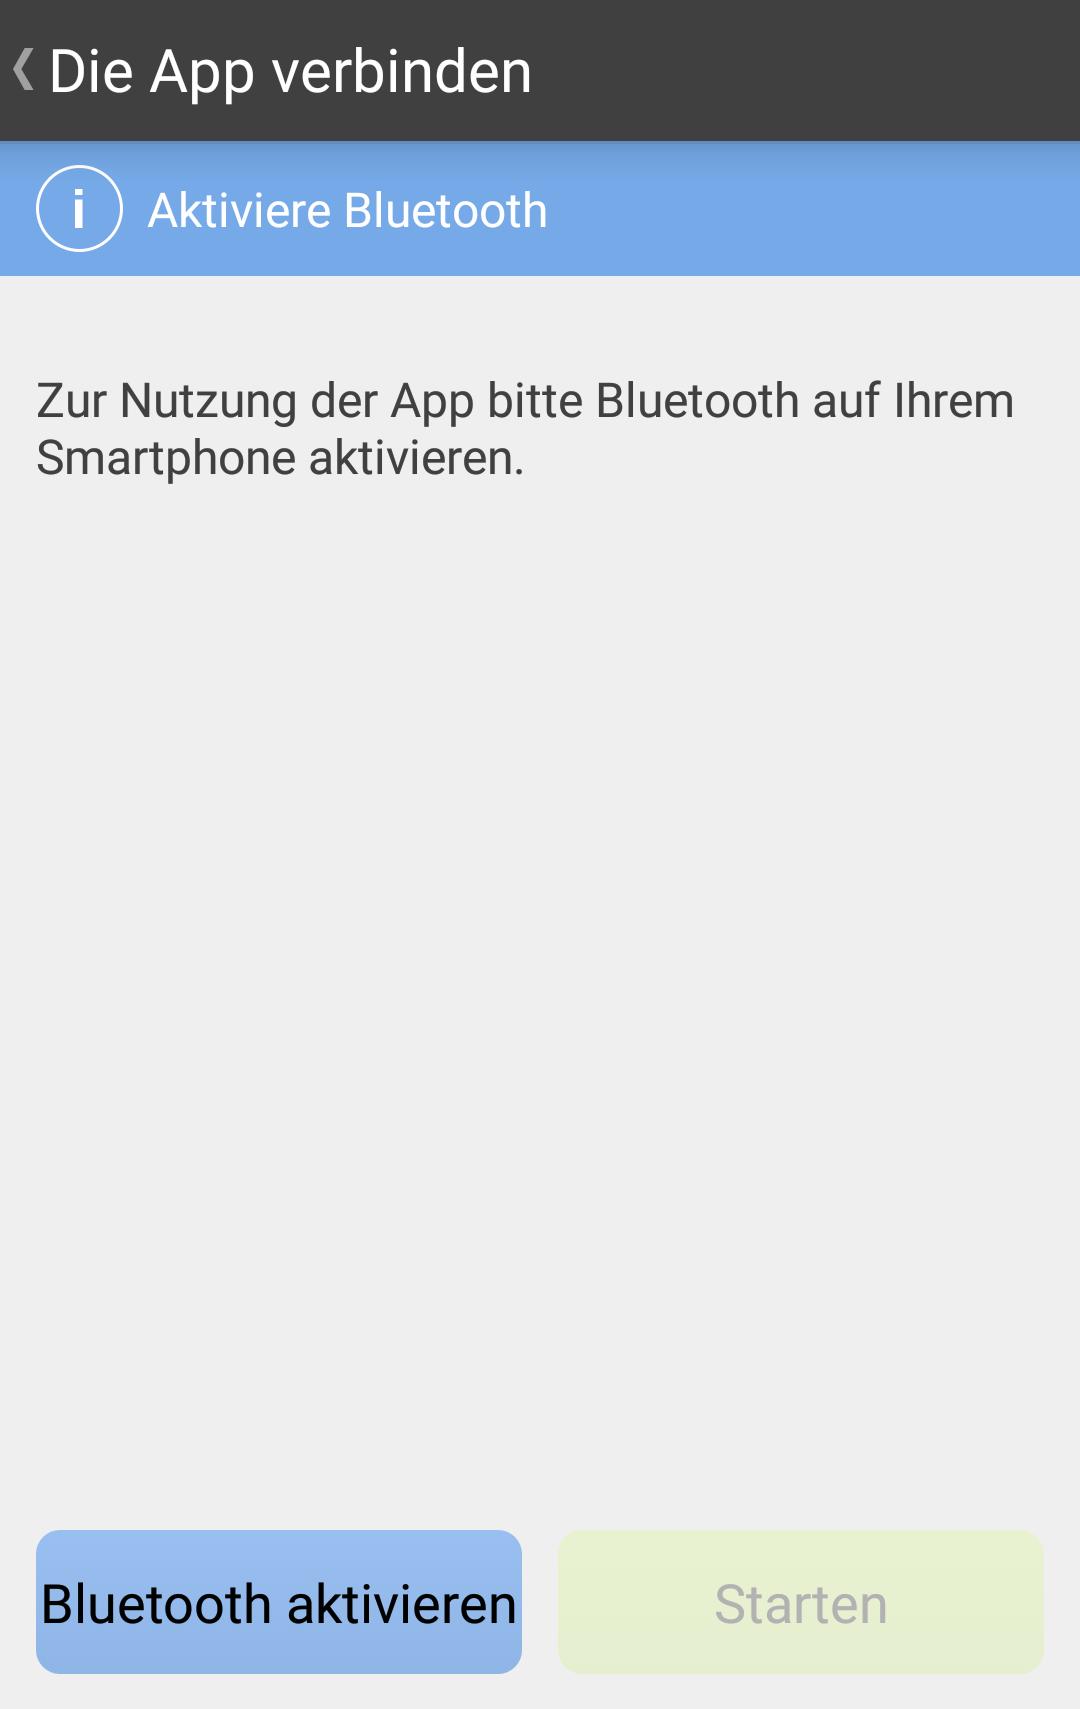 1. Schritt: Bluetooth muss aktiviert werden, um die Verbindung zum Telefon herzustellen.